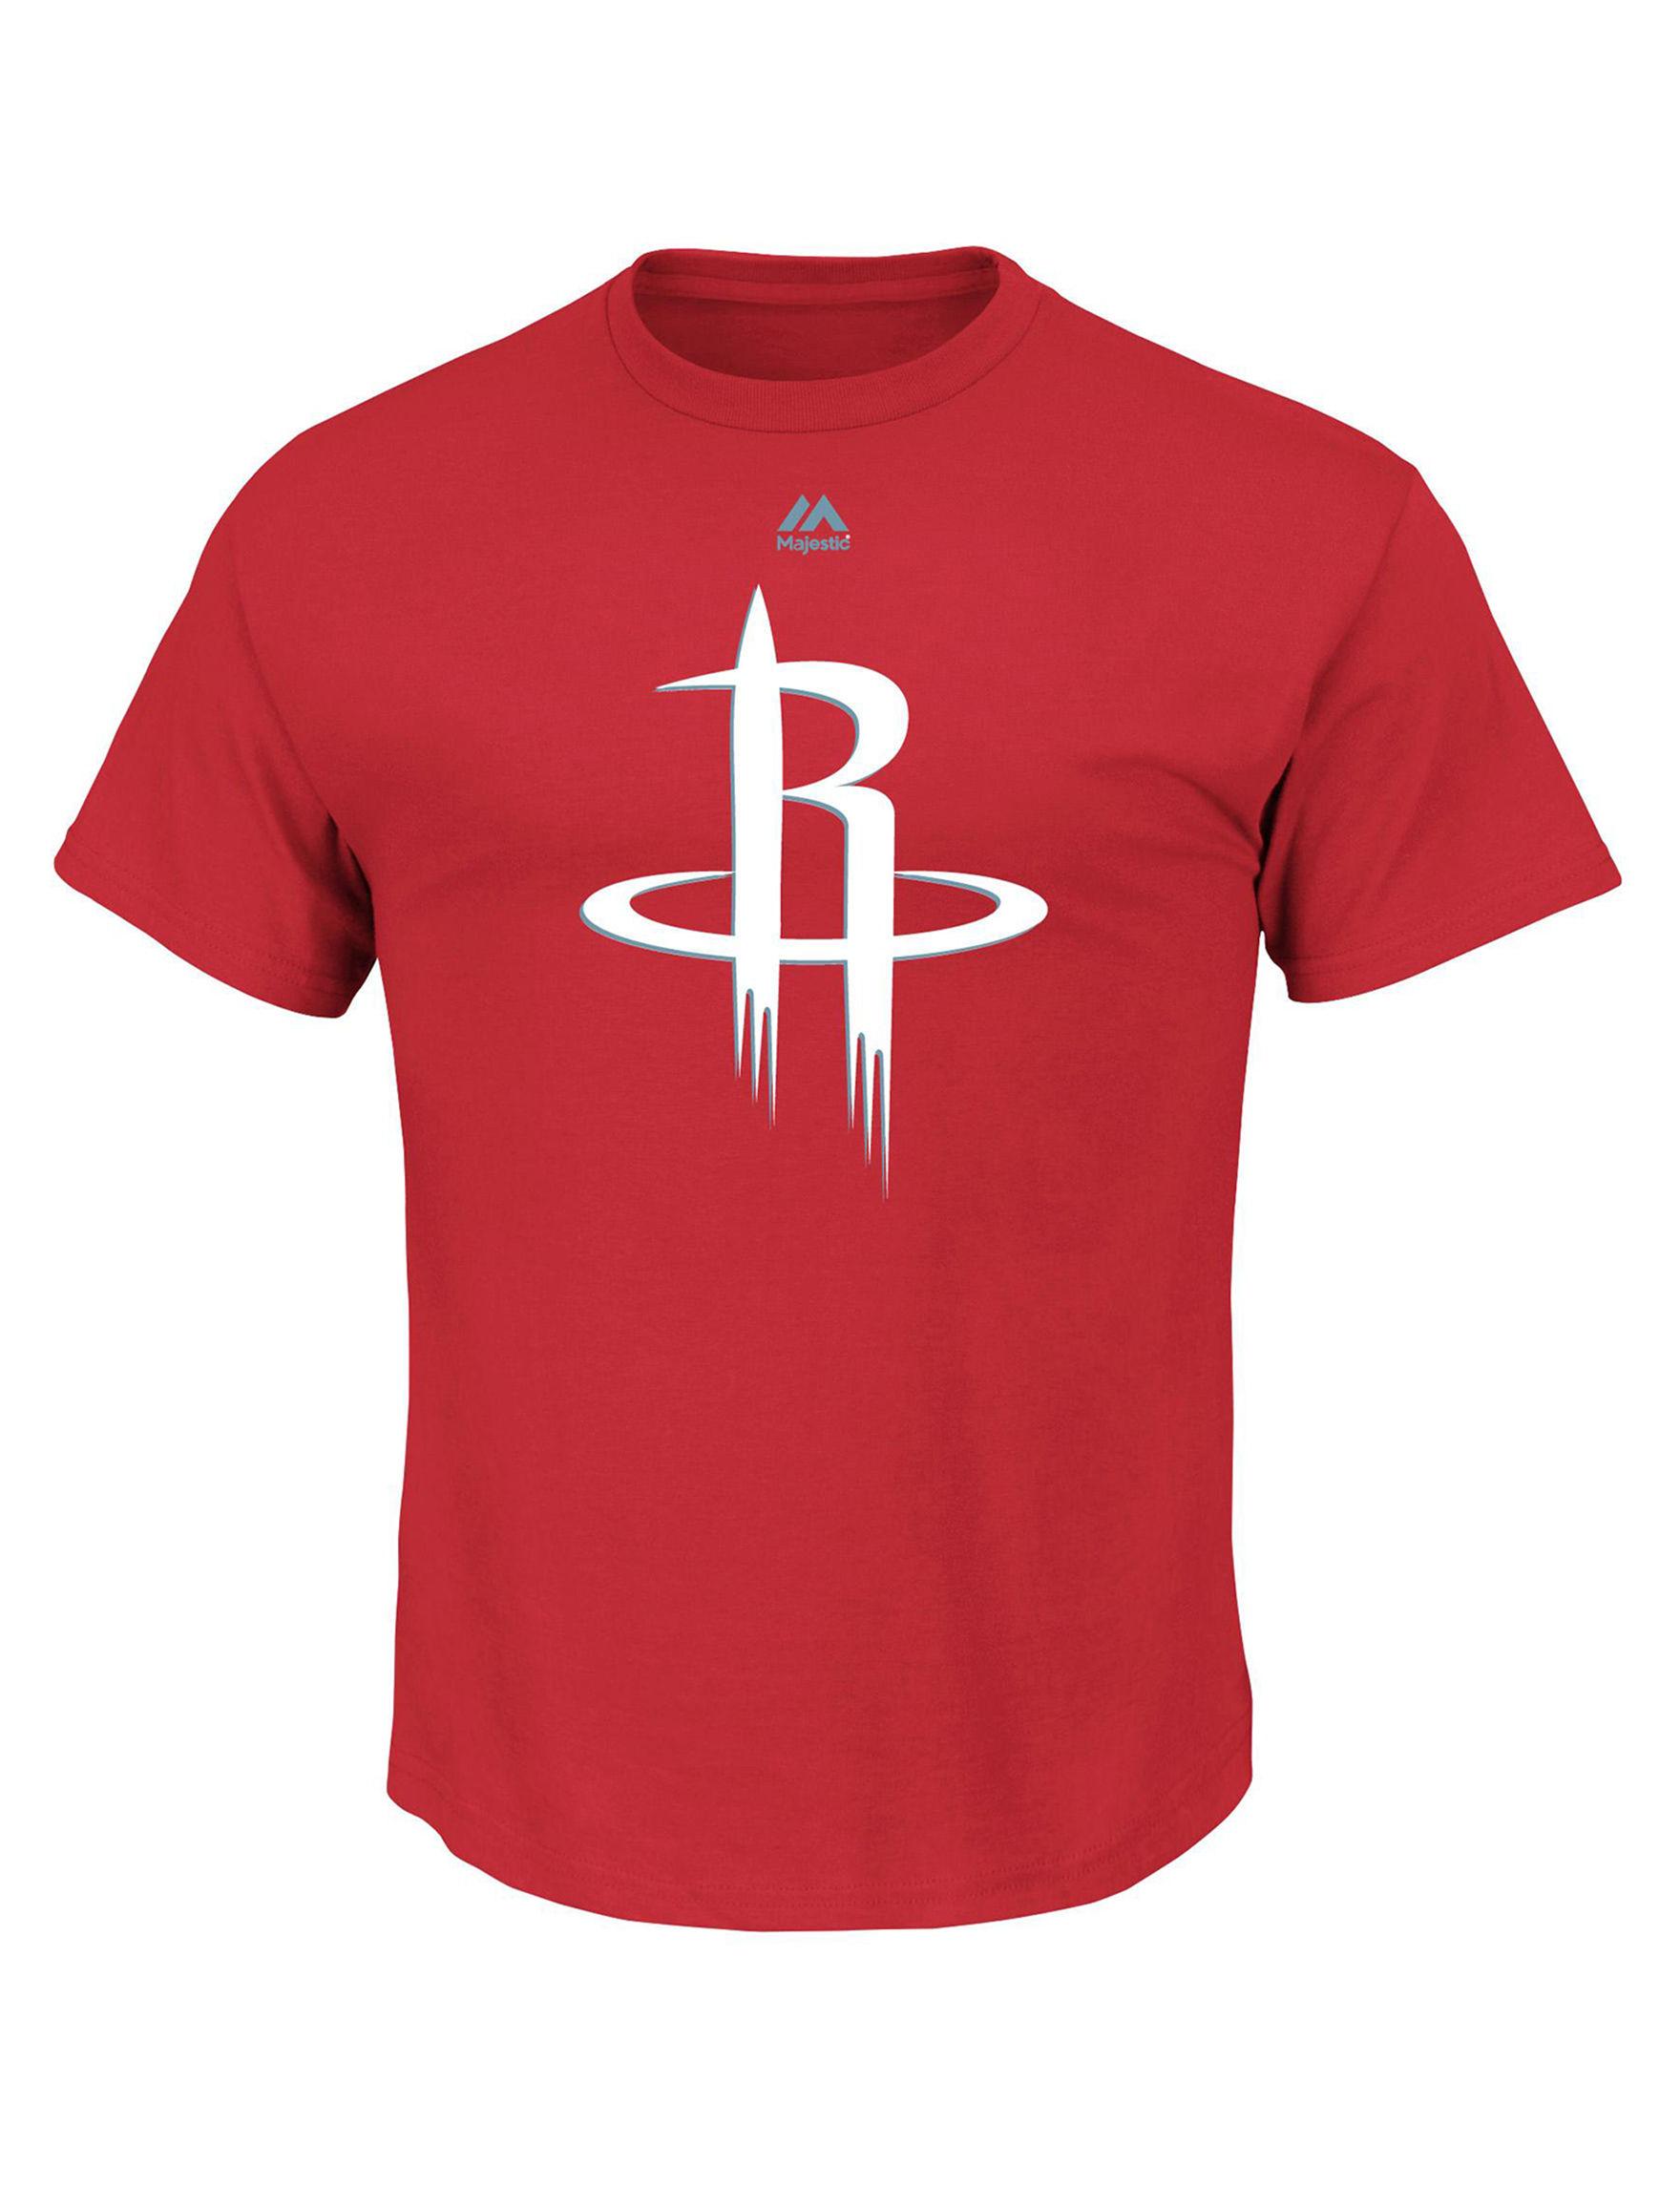 NBA Red Tees & Tanks